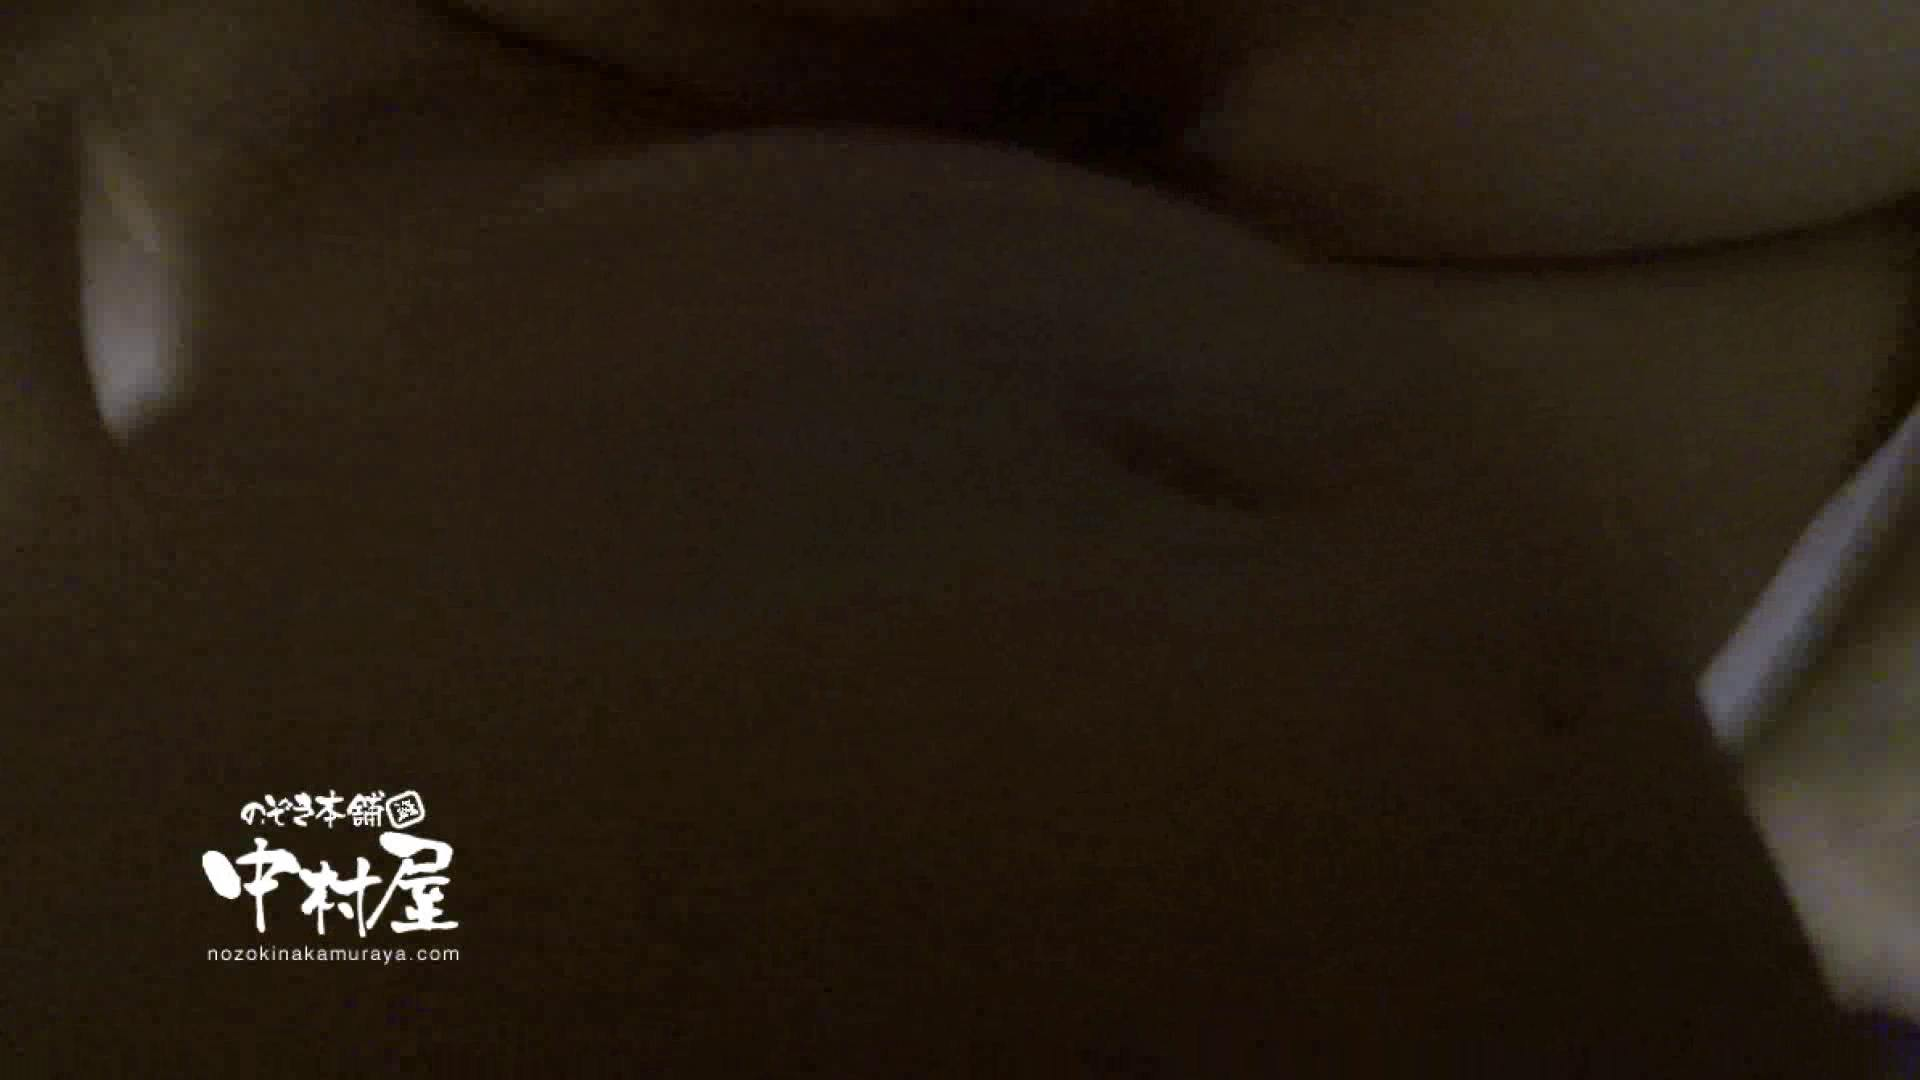 鬼畜 vol.08 極悪!妊娠覚悟の中出し! 後編 鬼畜  110PIX 60